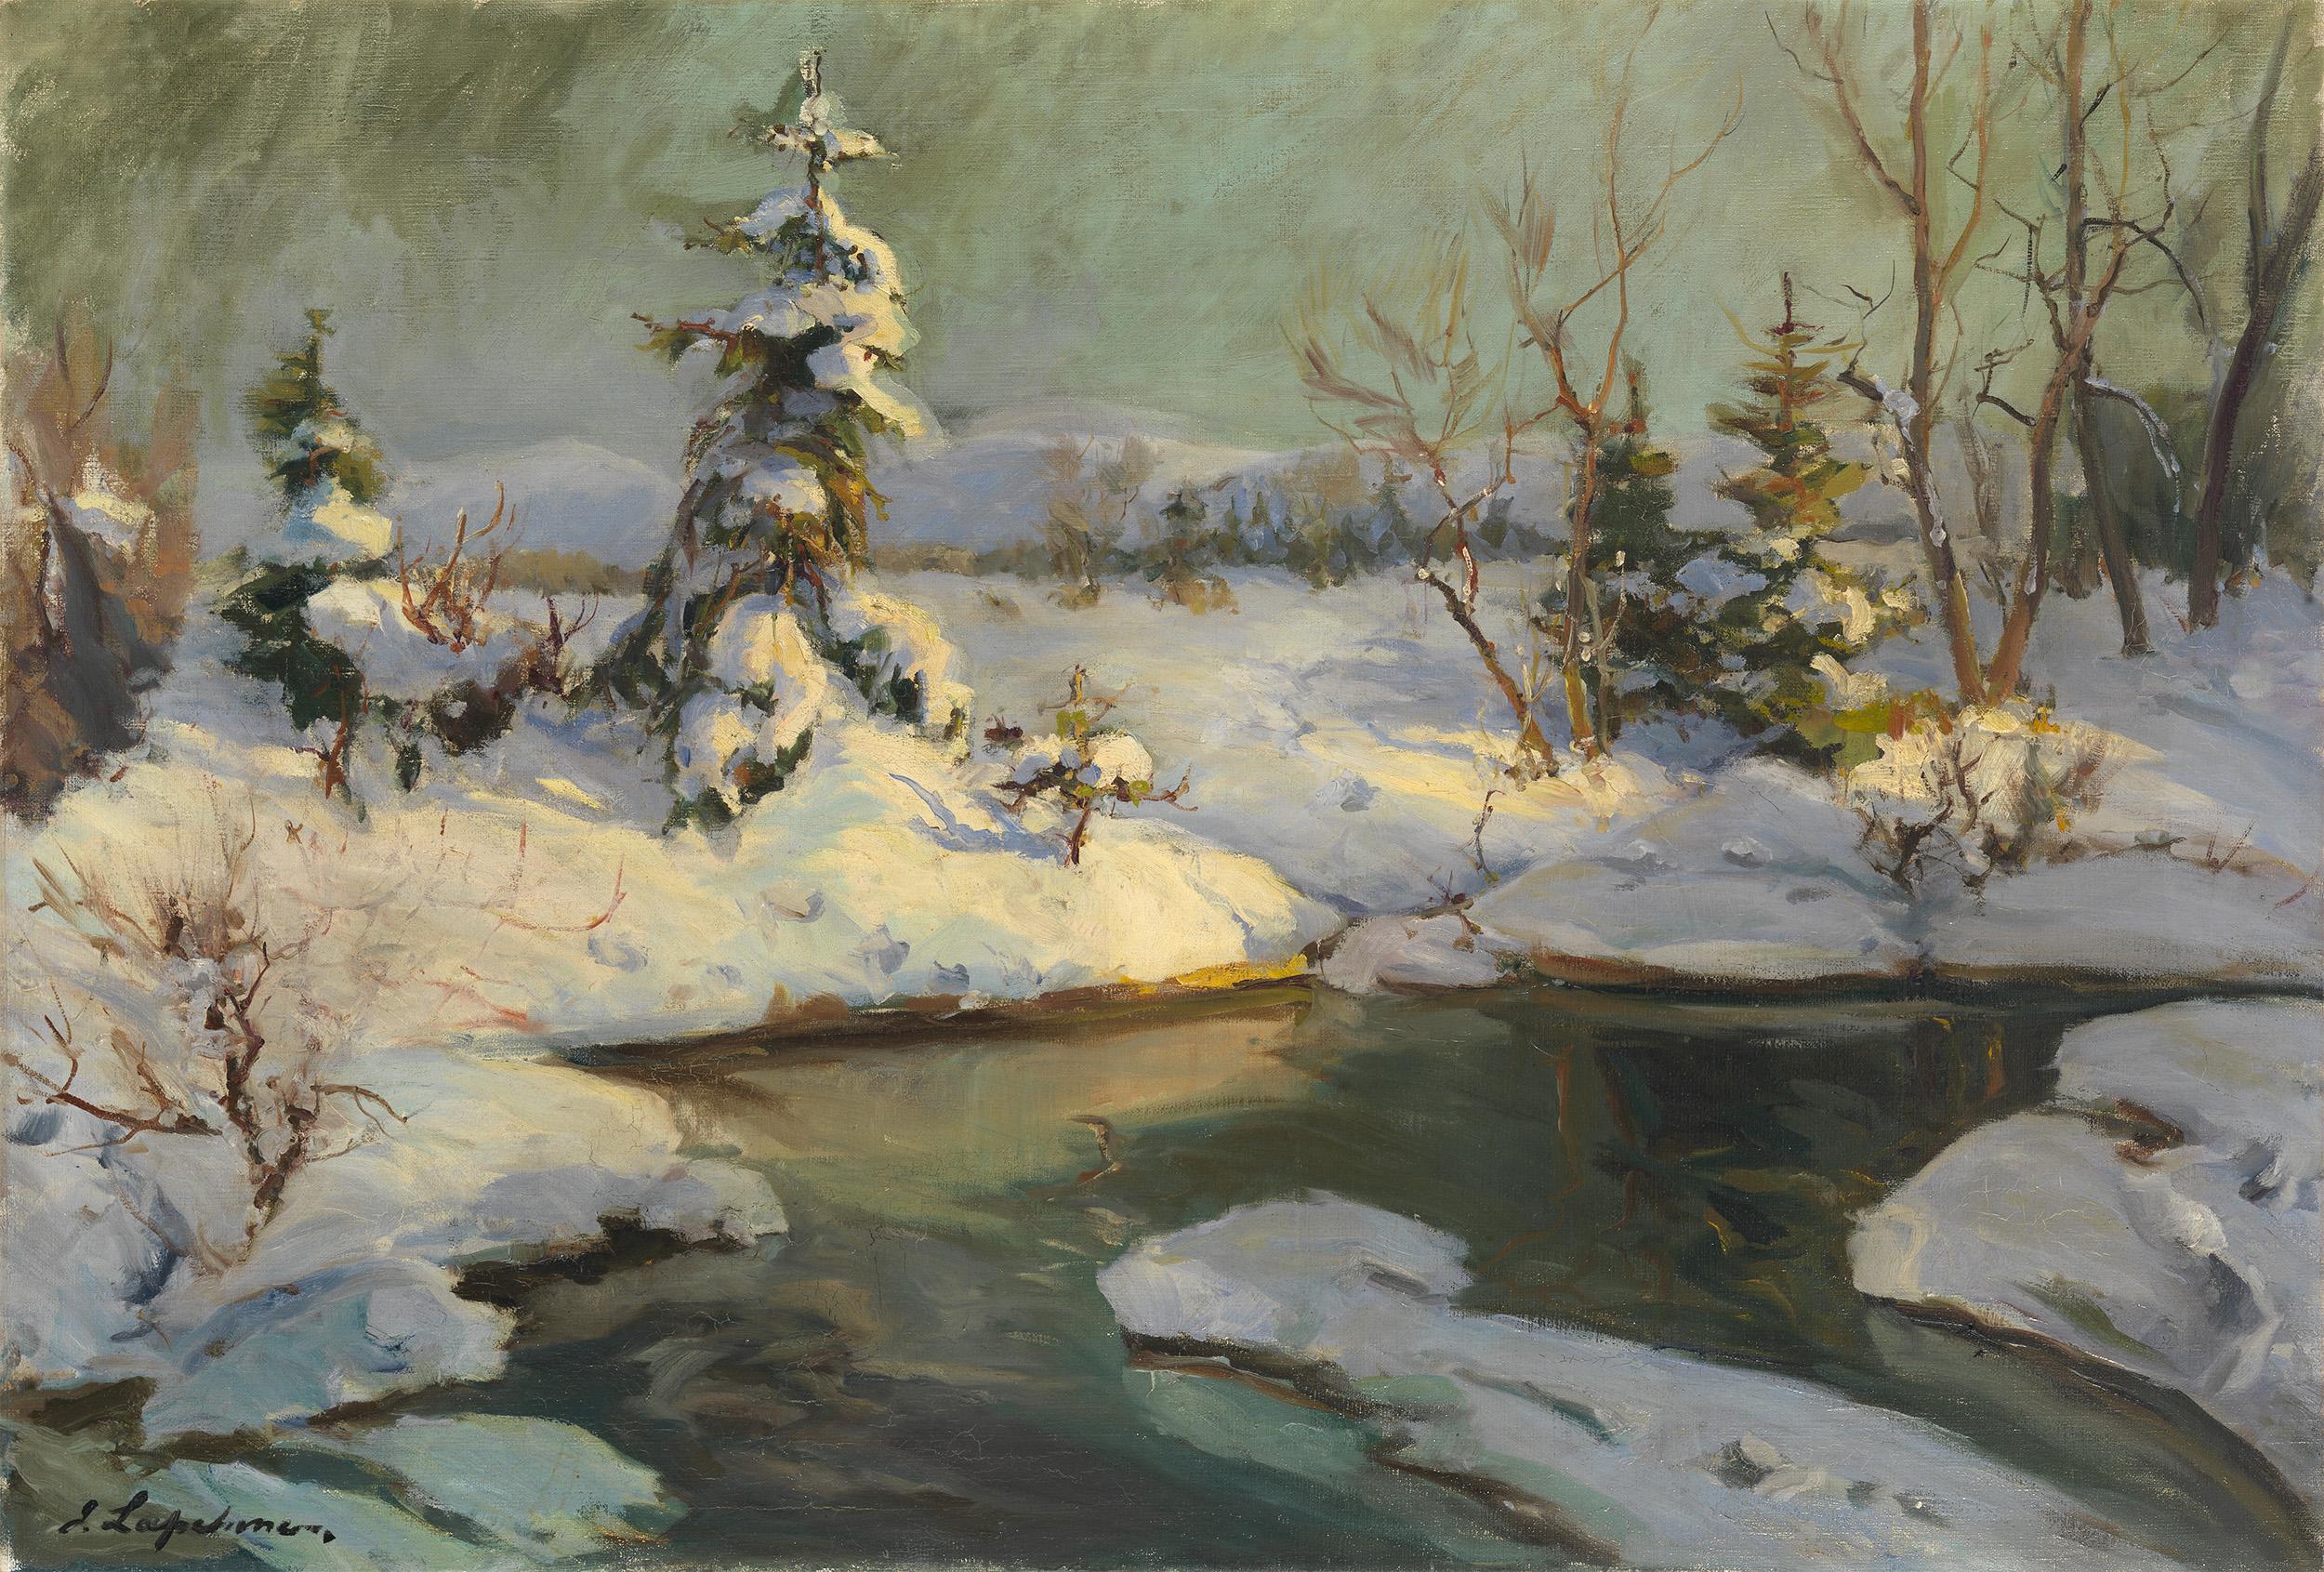 LAPCHINE, GEORGES Winter Landscape